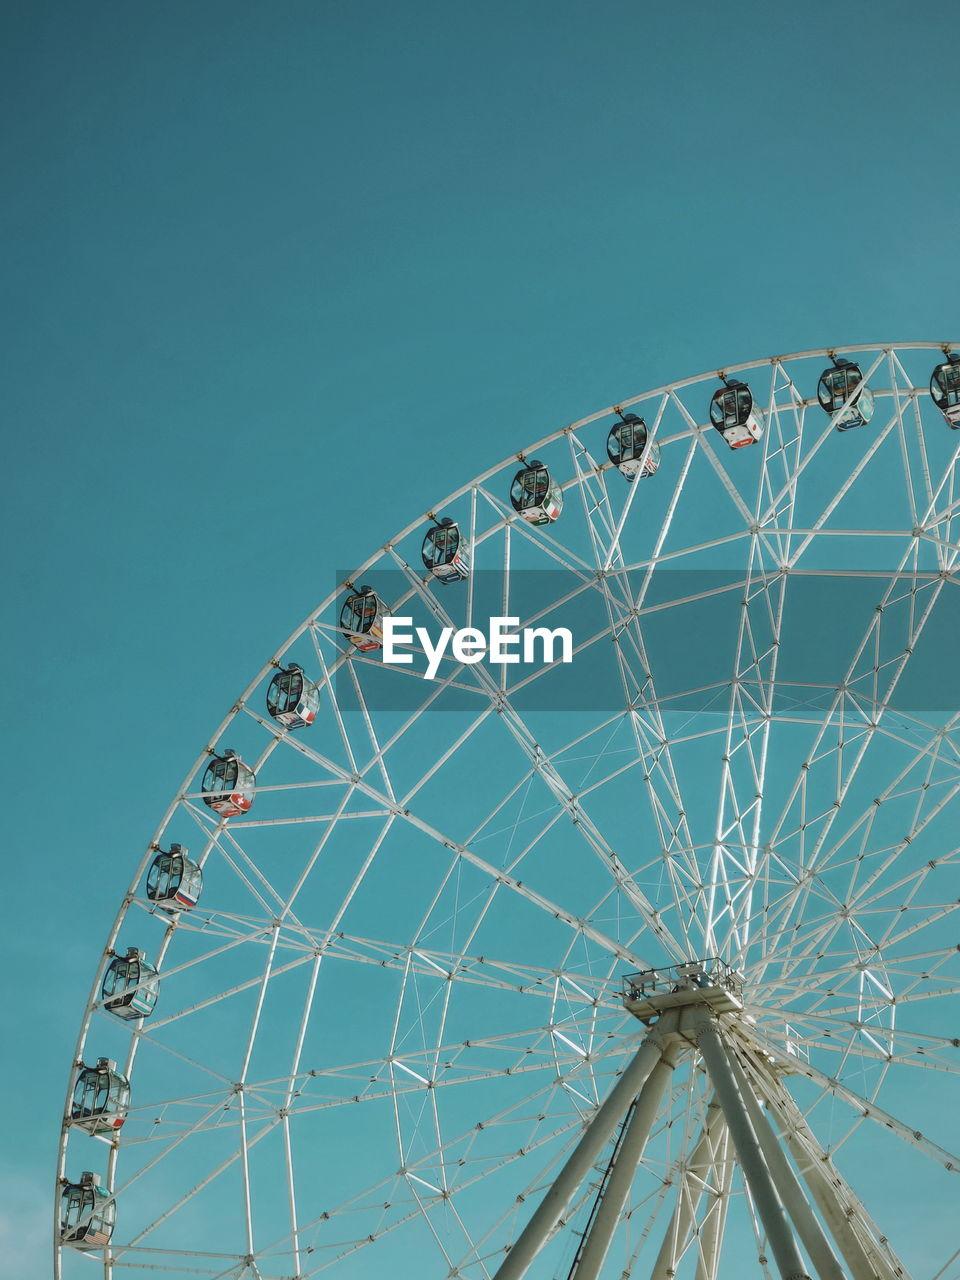 amusement park ride, amusement park, sky, arts culture and entertainment, ferris wheel, low angle view, clear sky, nature, blue, no people, fairground, large, leisure activity, outdoors, geometric shape, circle, day, shape, architecture, built structure, high, spoke